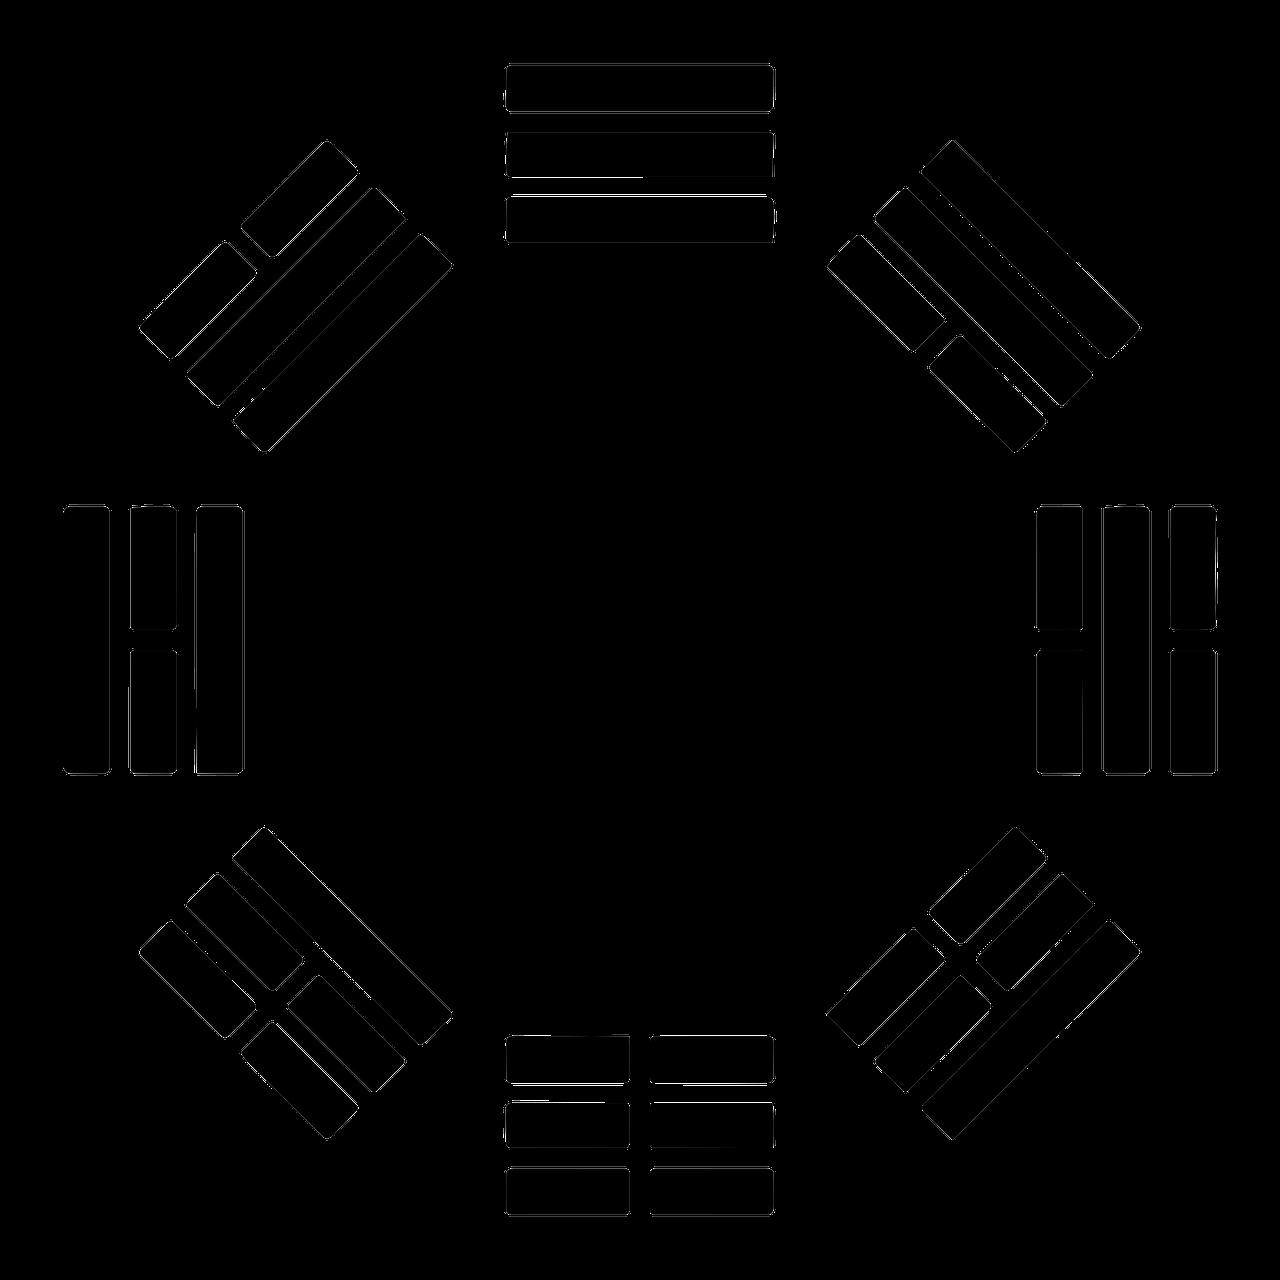 I Ching hexagramas